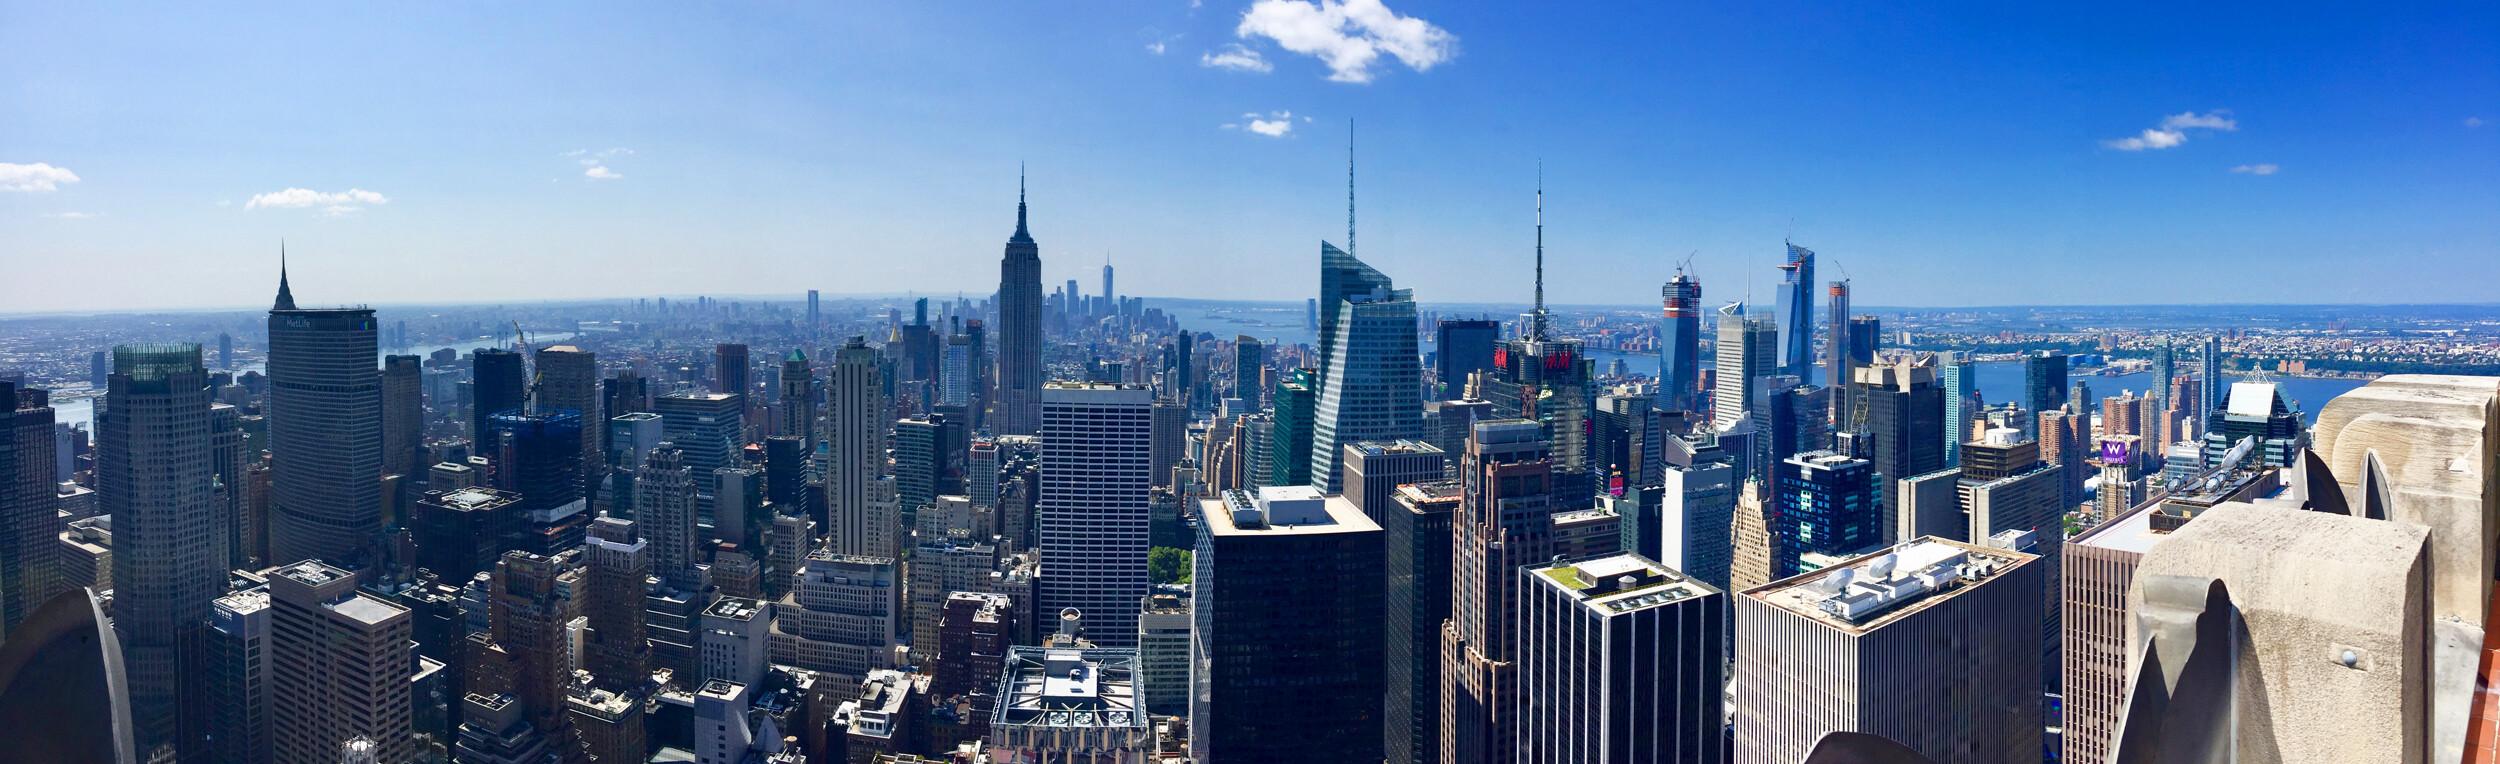 Reisebericht New York City - Top of the Rock